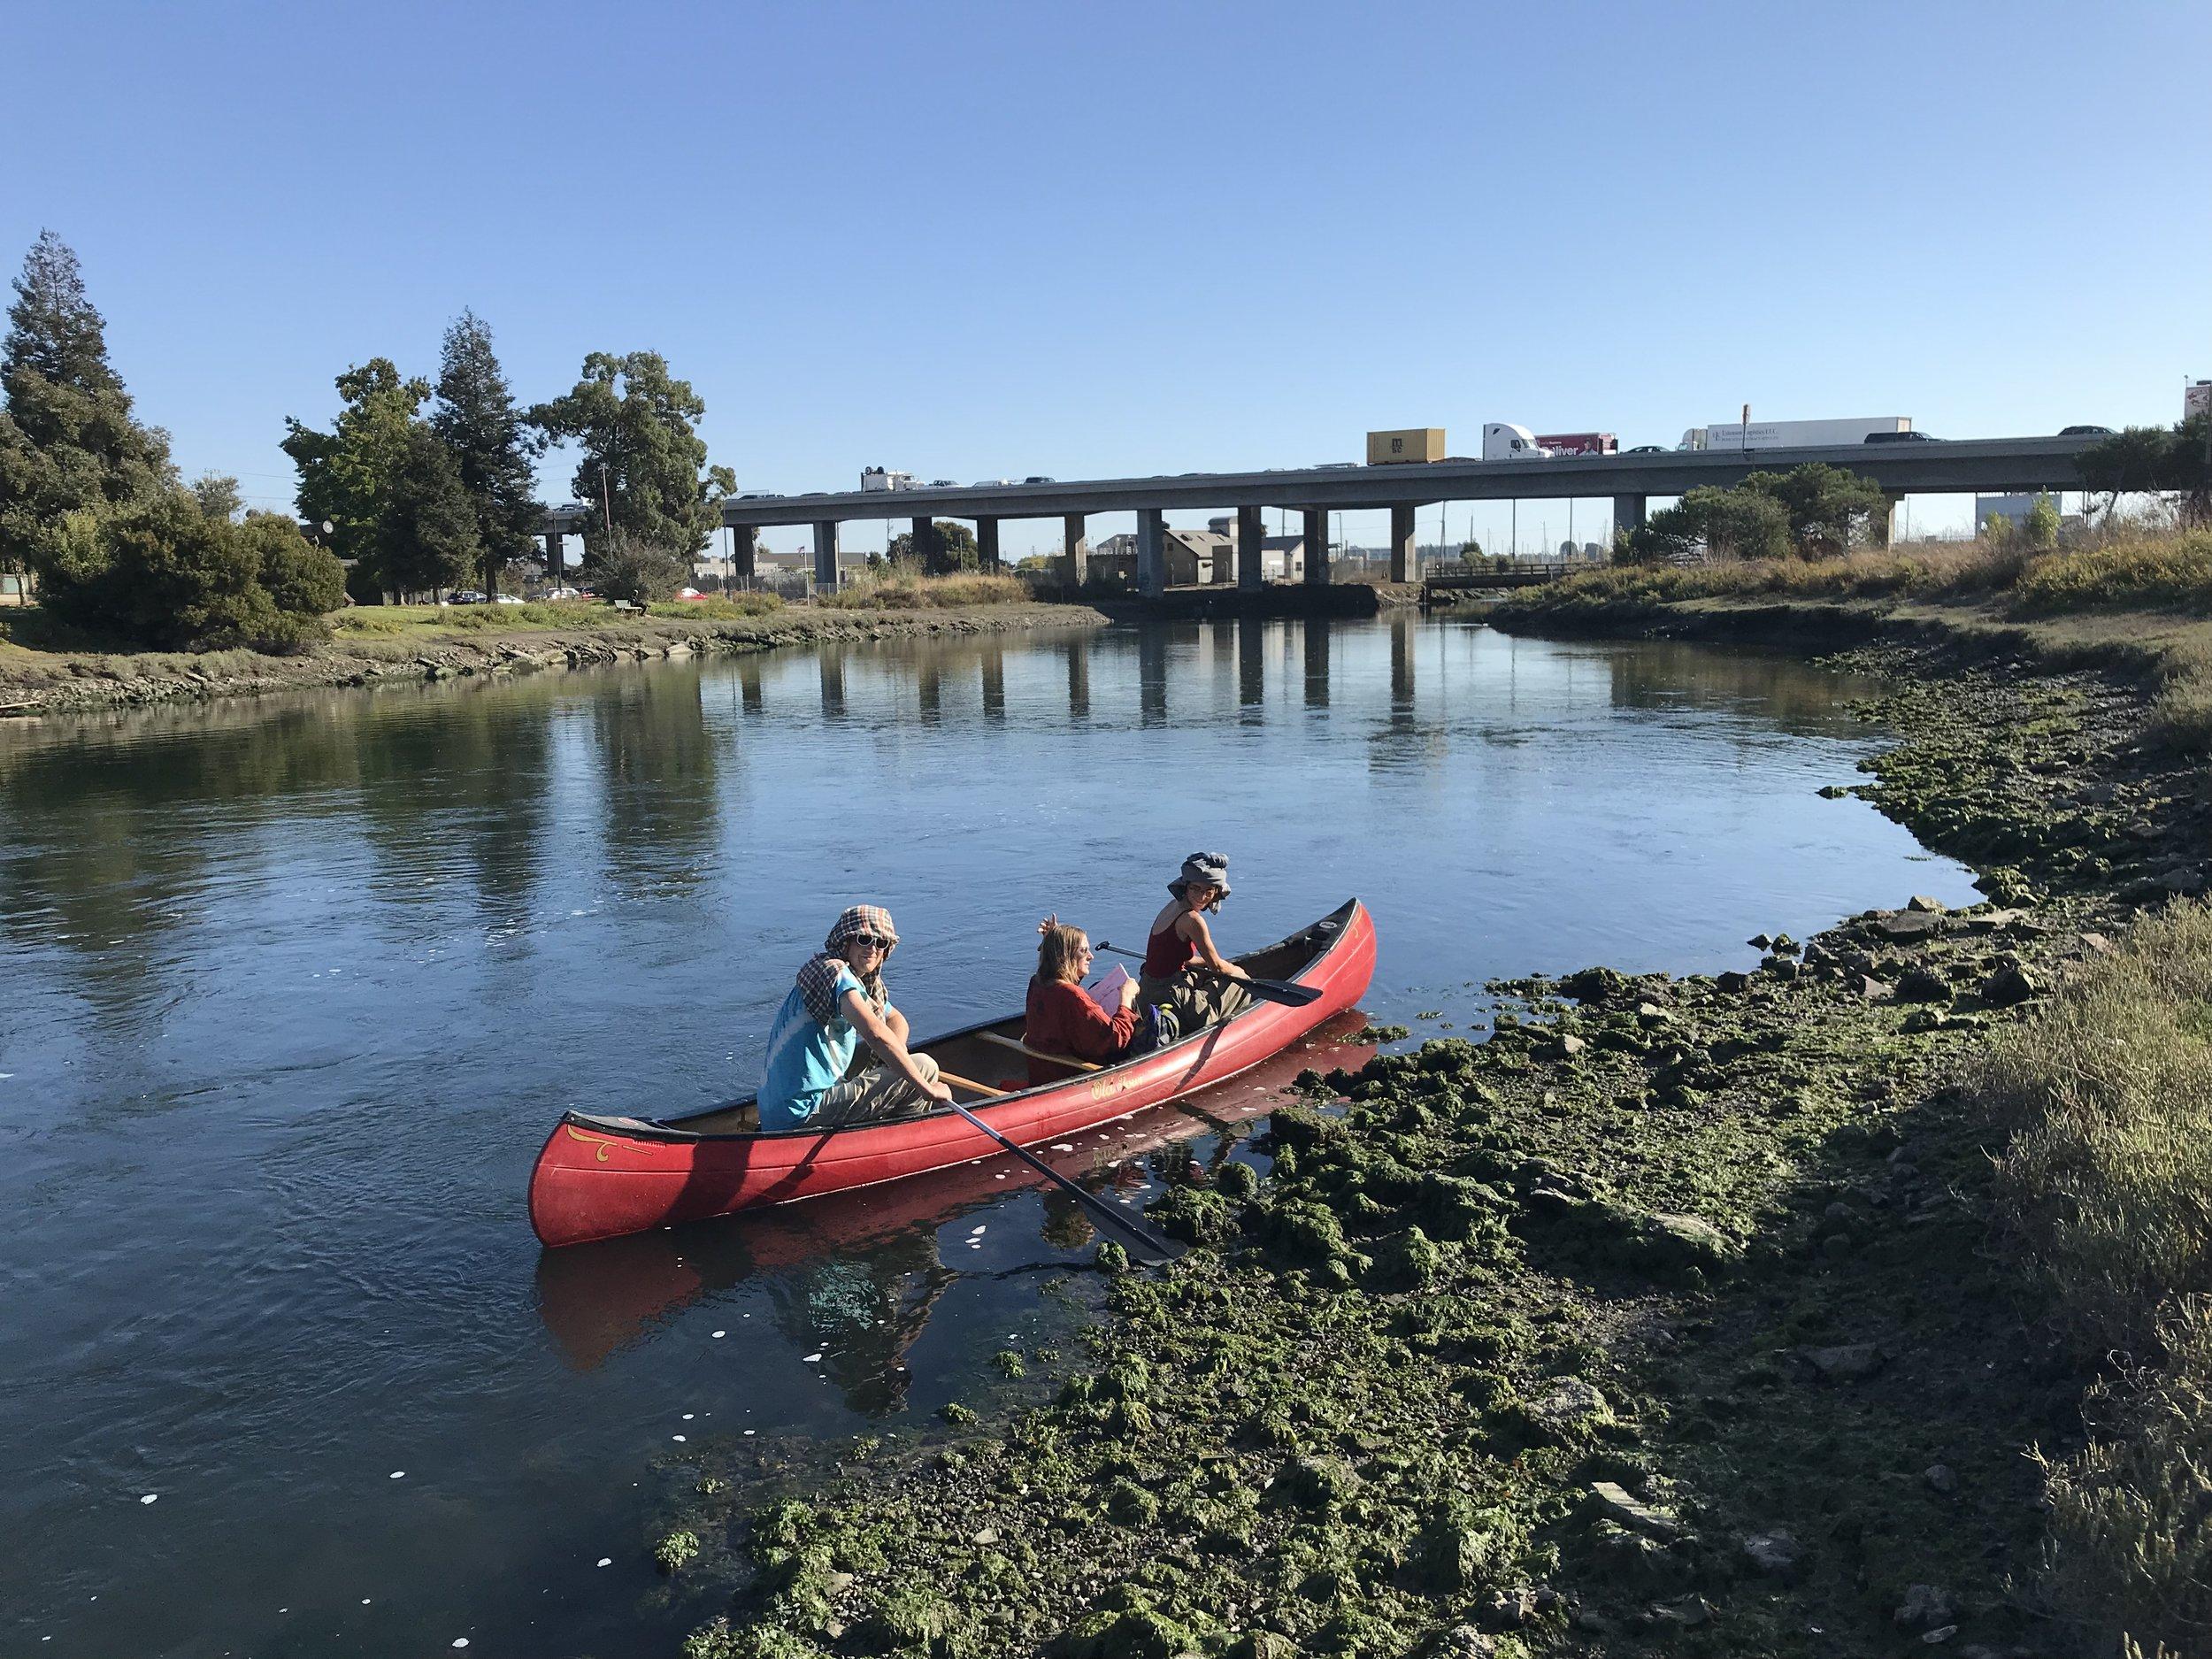 Channeling workshop, Lake Merritt to the Estuary, Oakland, CA